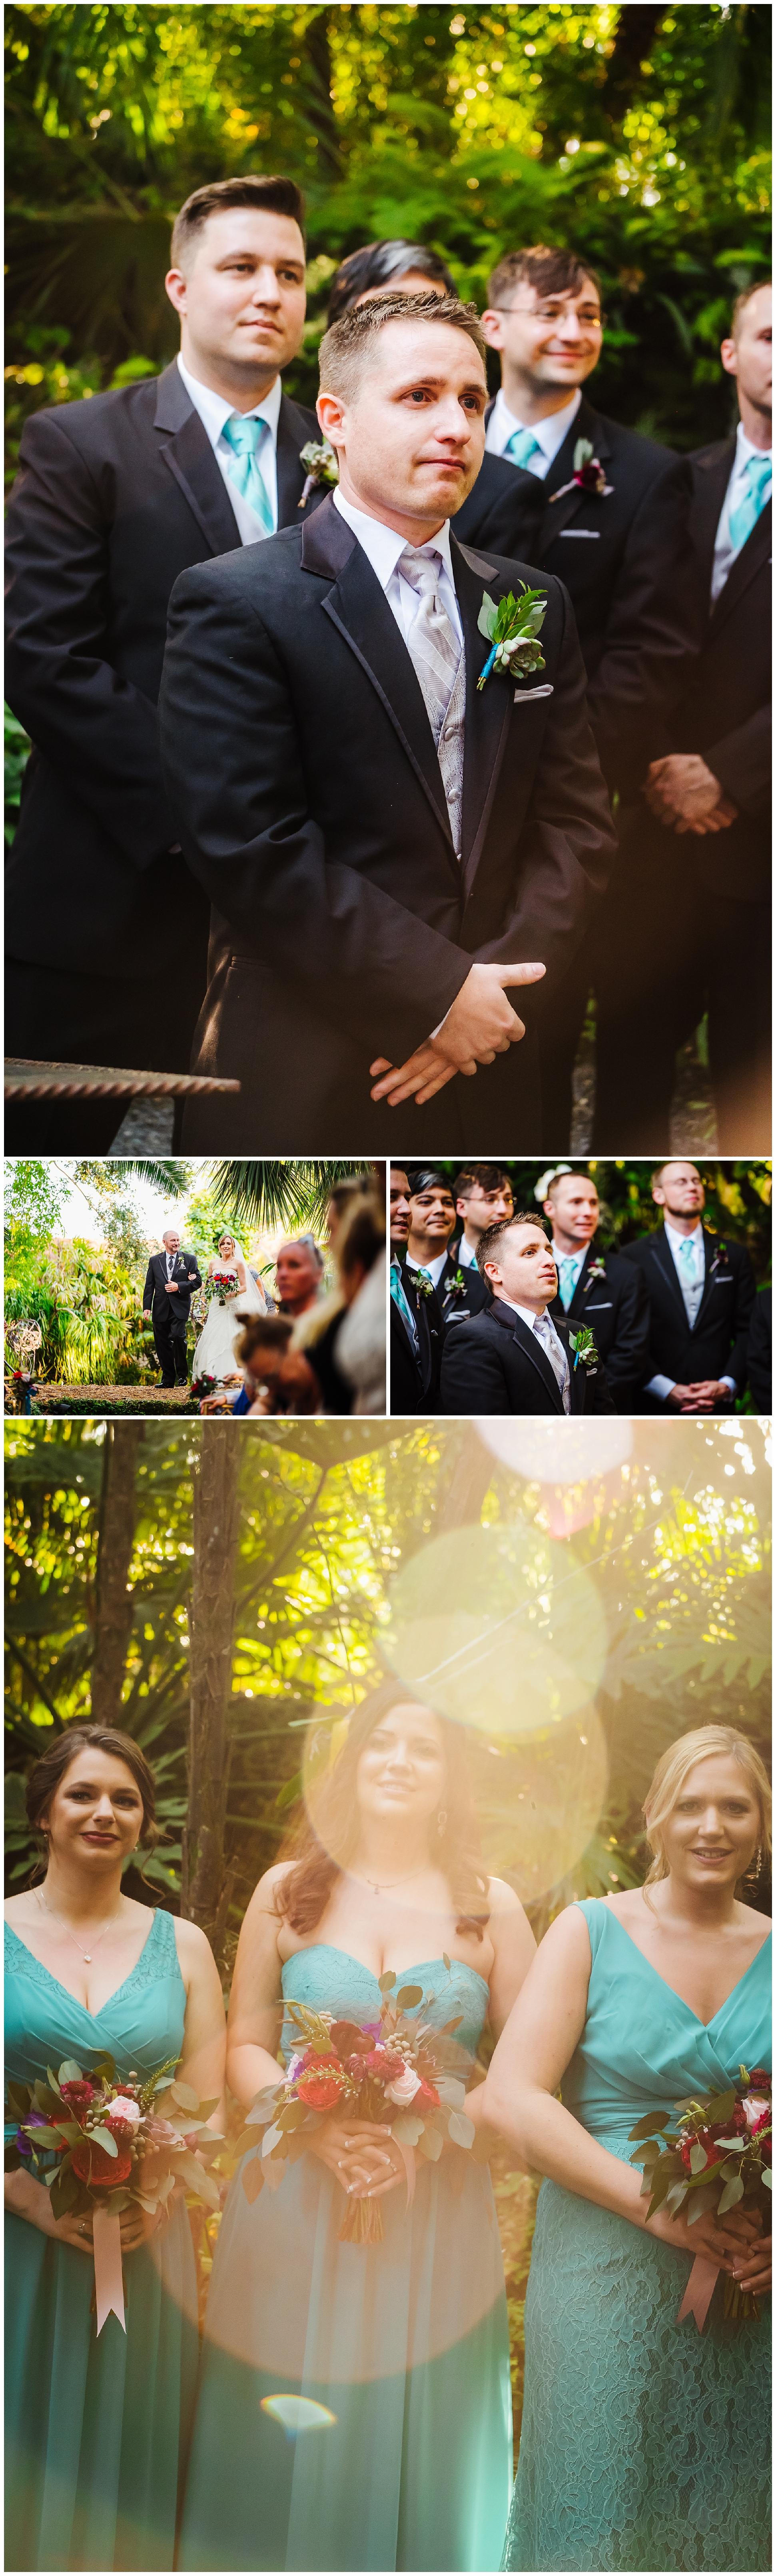 florida-destination-wedding-photographer-enchanted-tropical-miami-homestead-cooper-estate-teal_0045.jpg